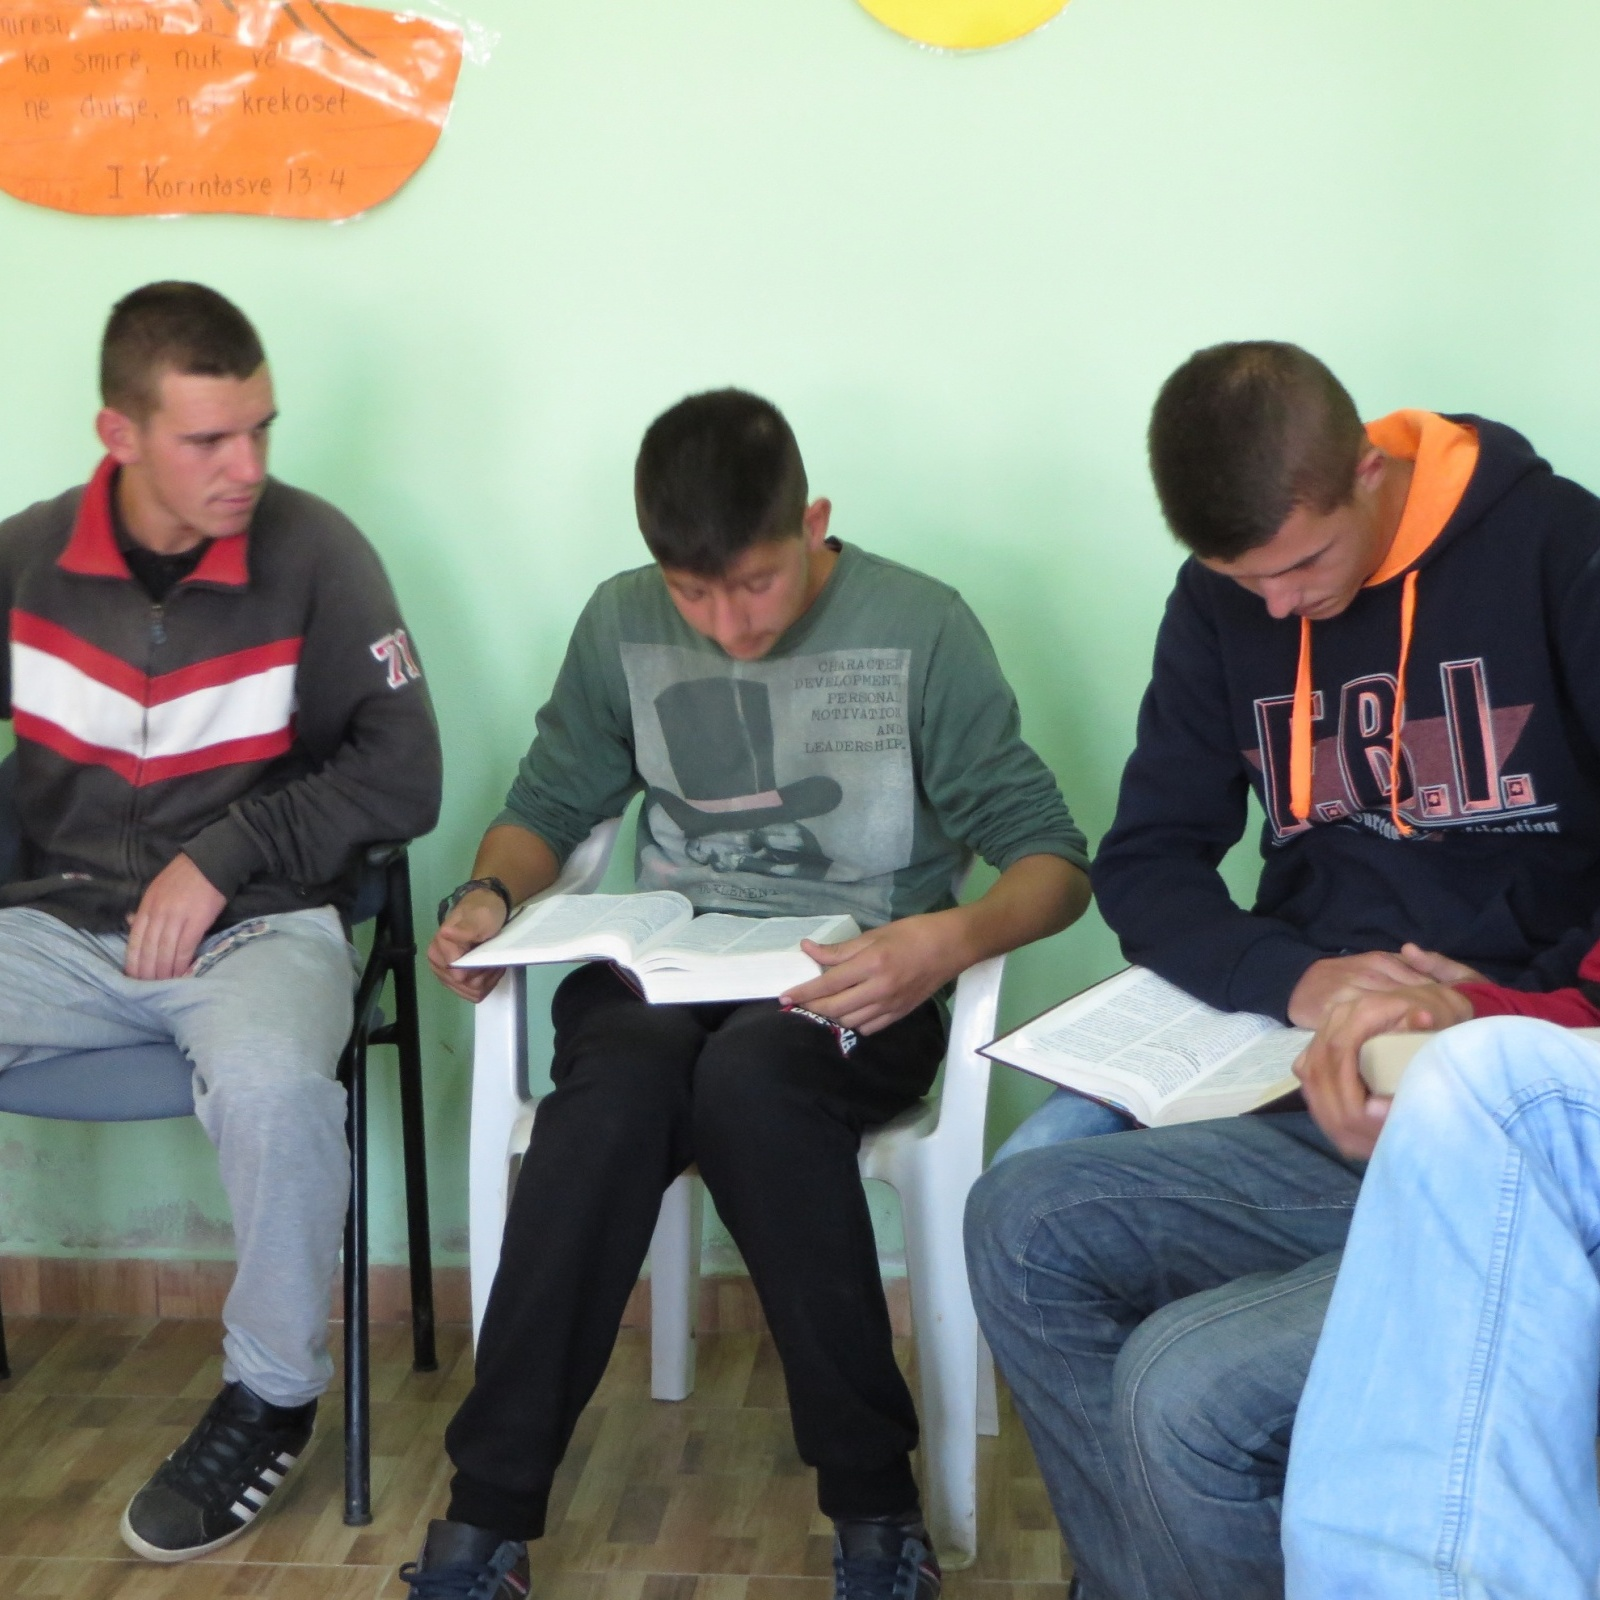 Albania boys group